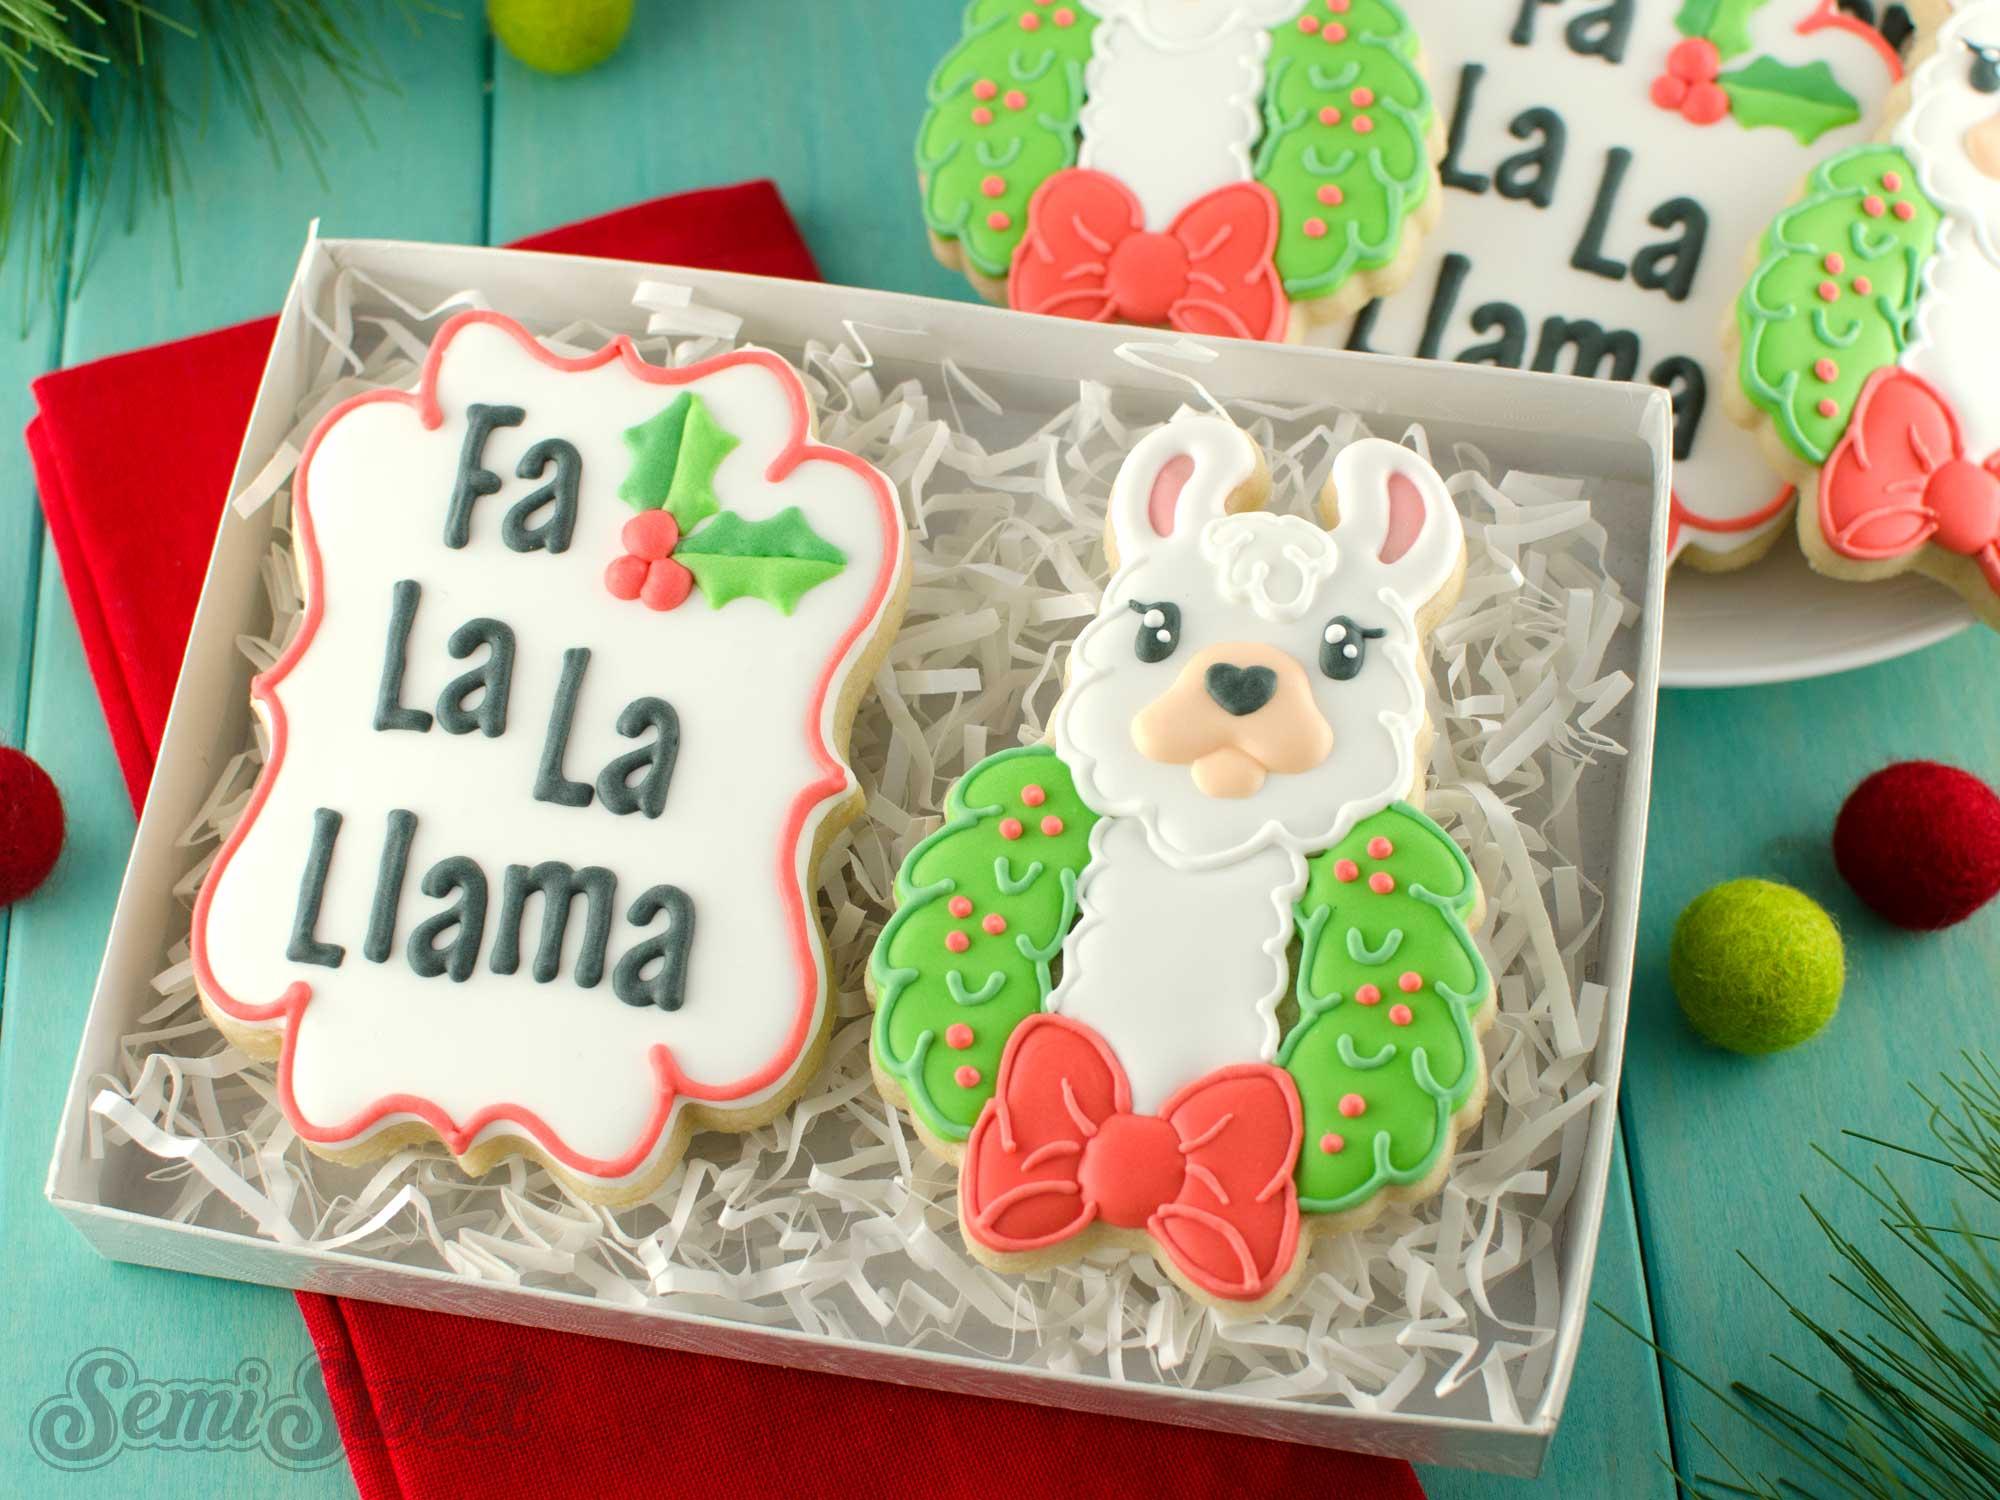 How to Make Christmas Llama Cookies